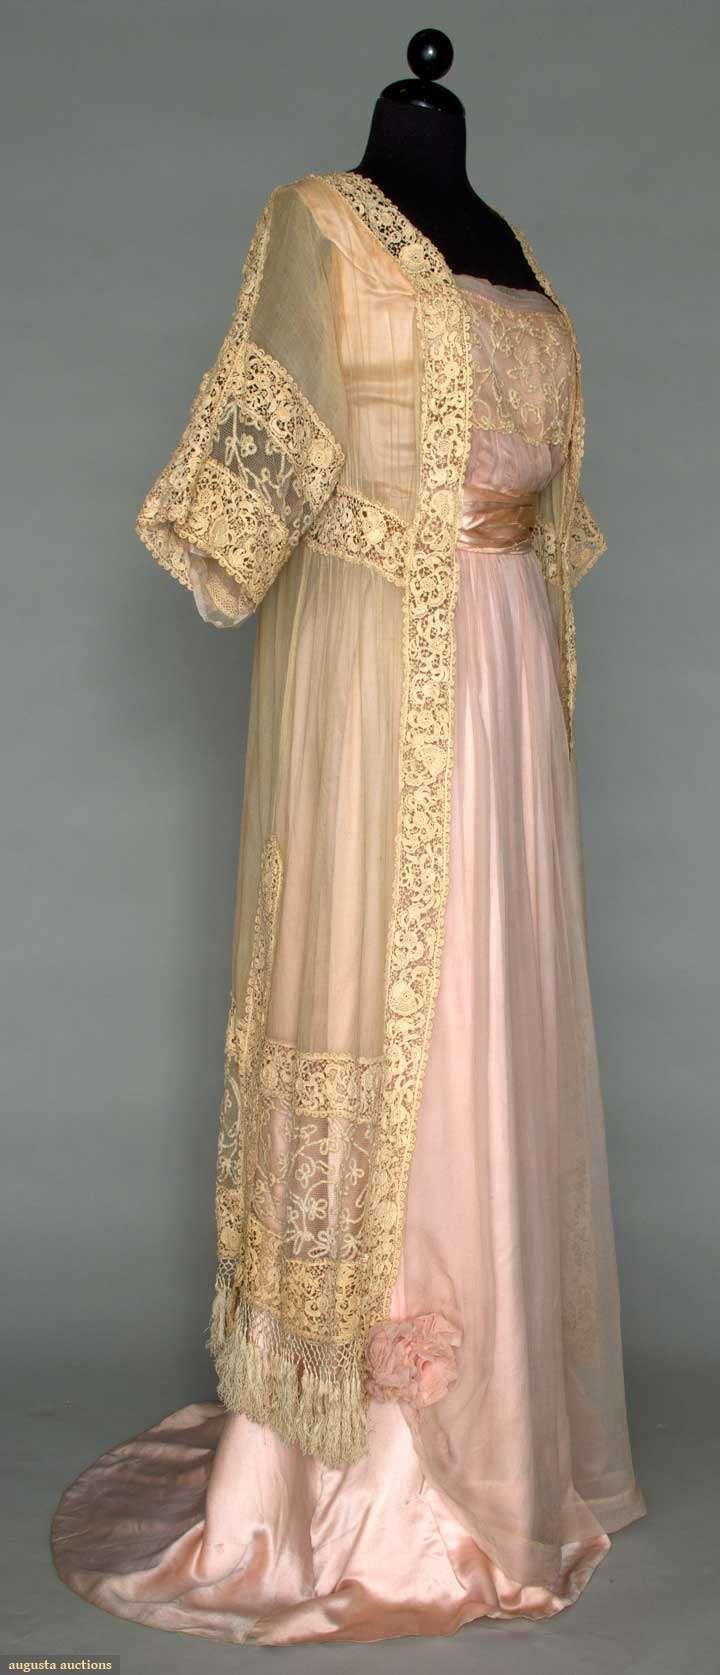 c. 1912 Edwardian gown